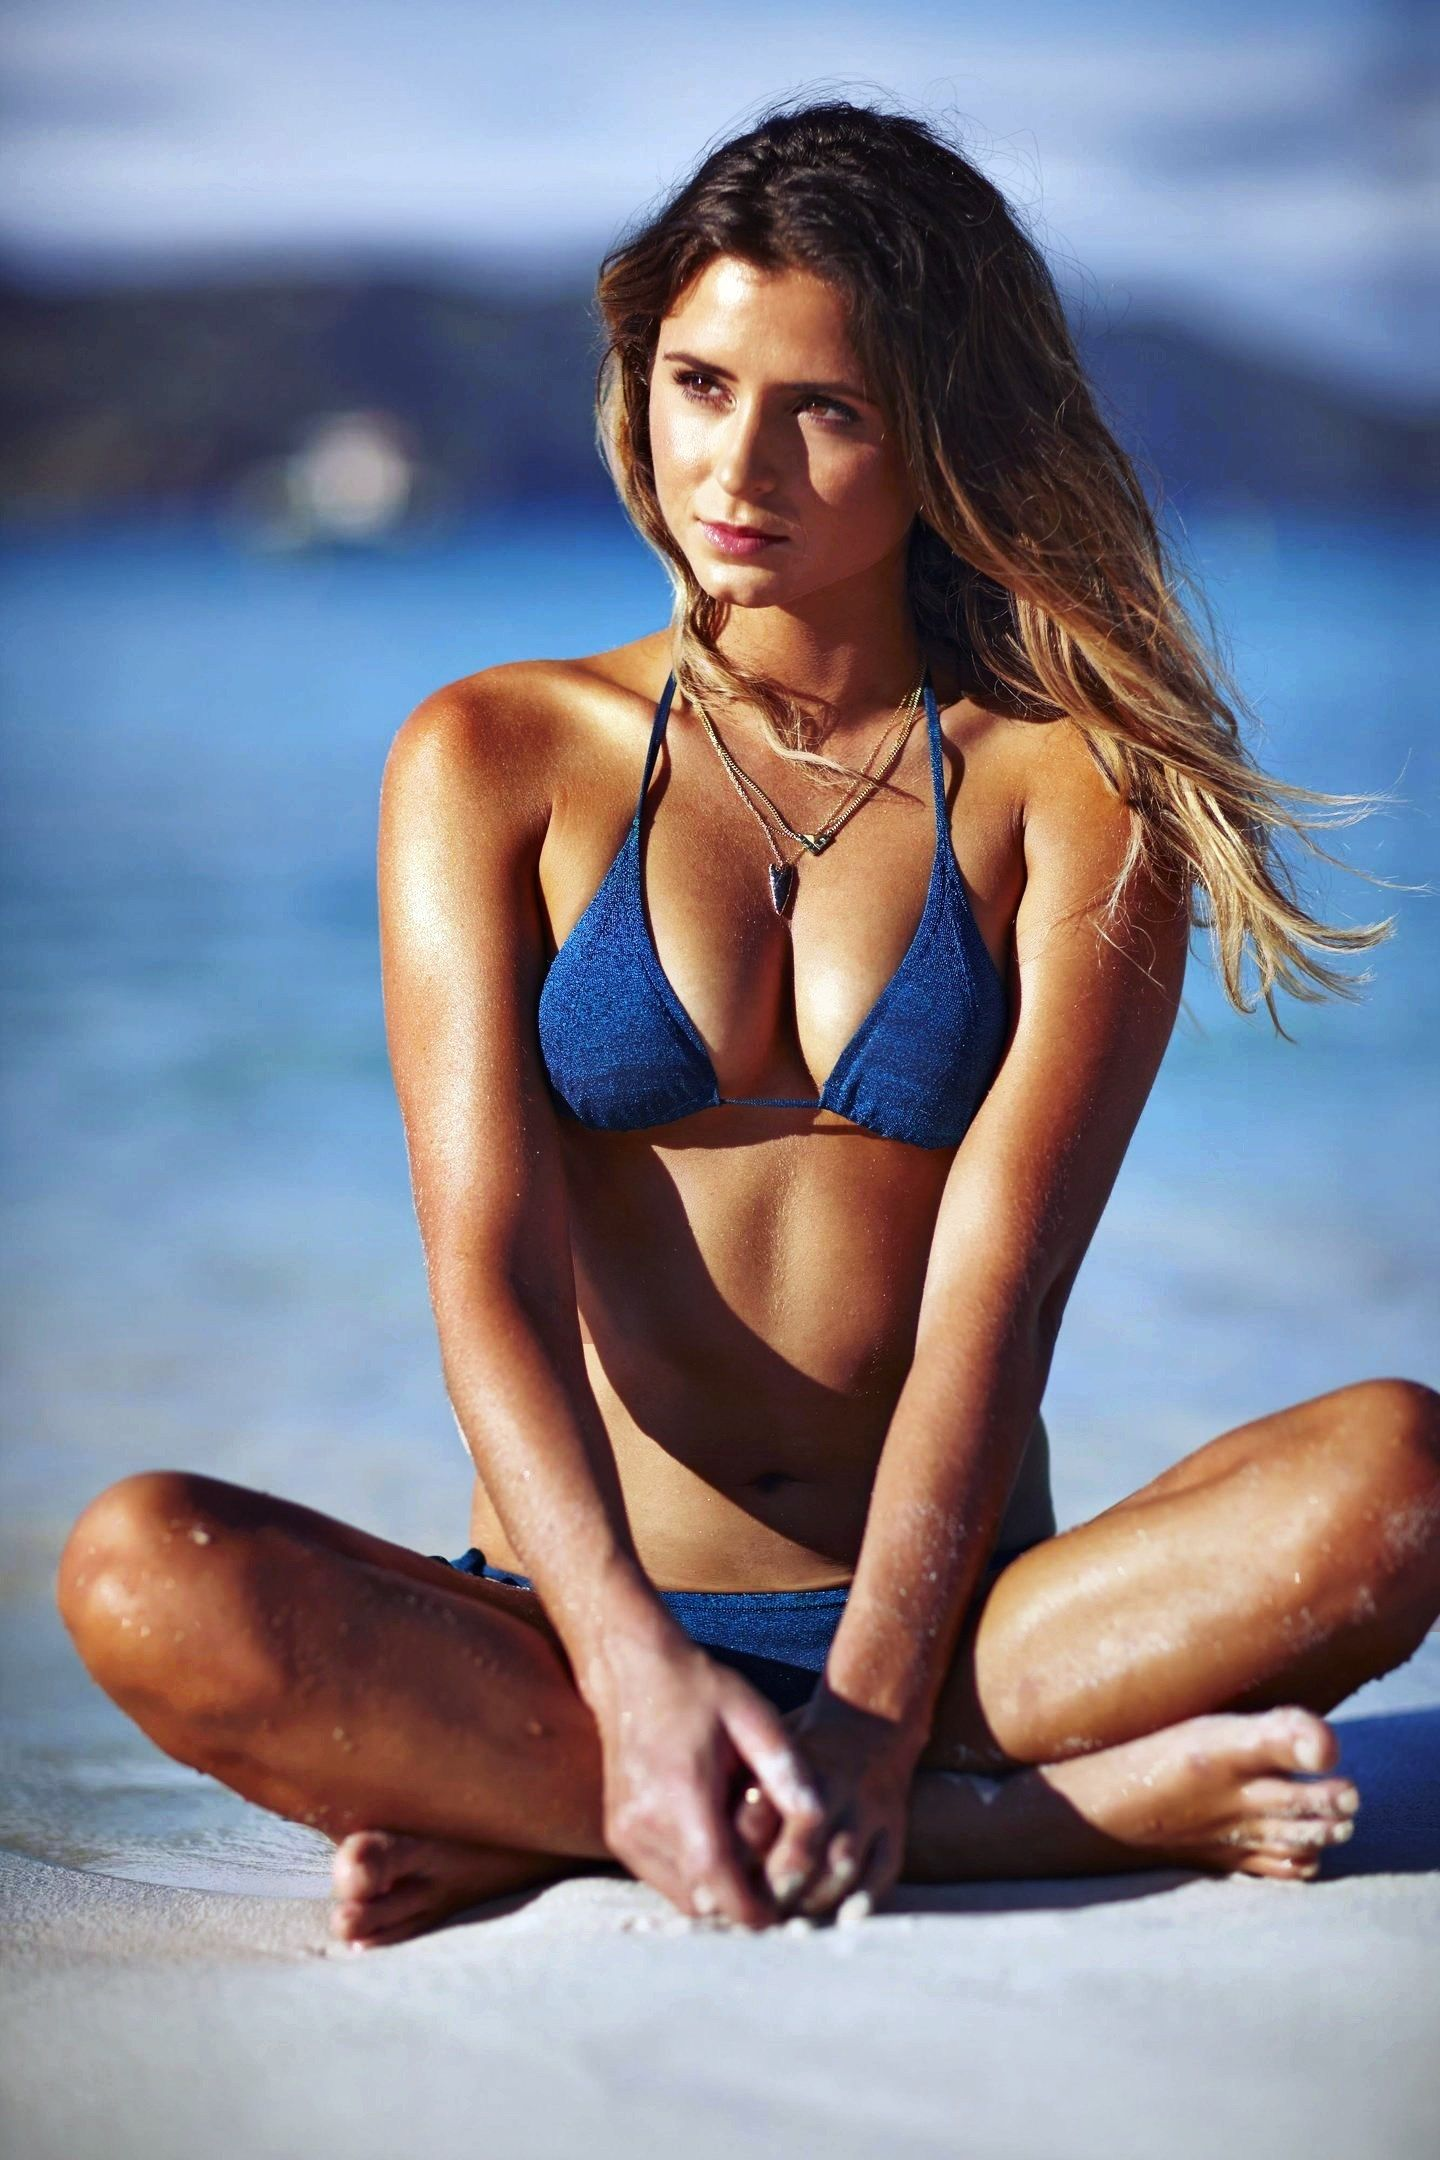 Hot Anastasia Ashley nude photos 2019